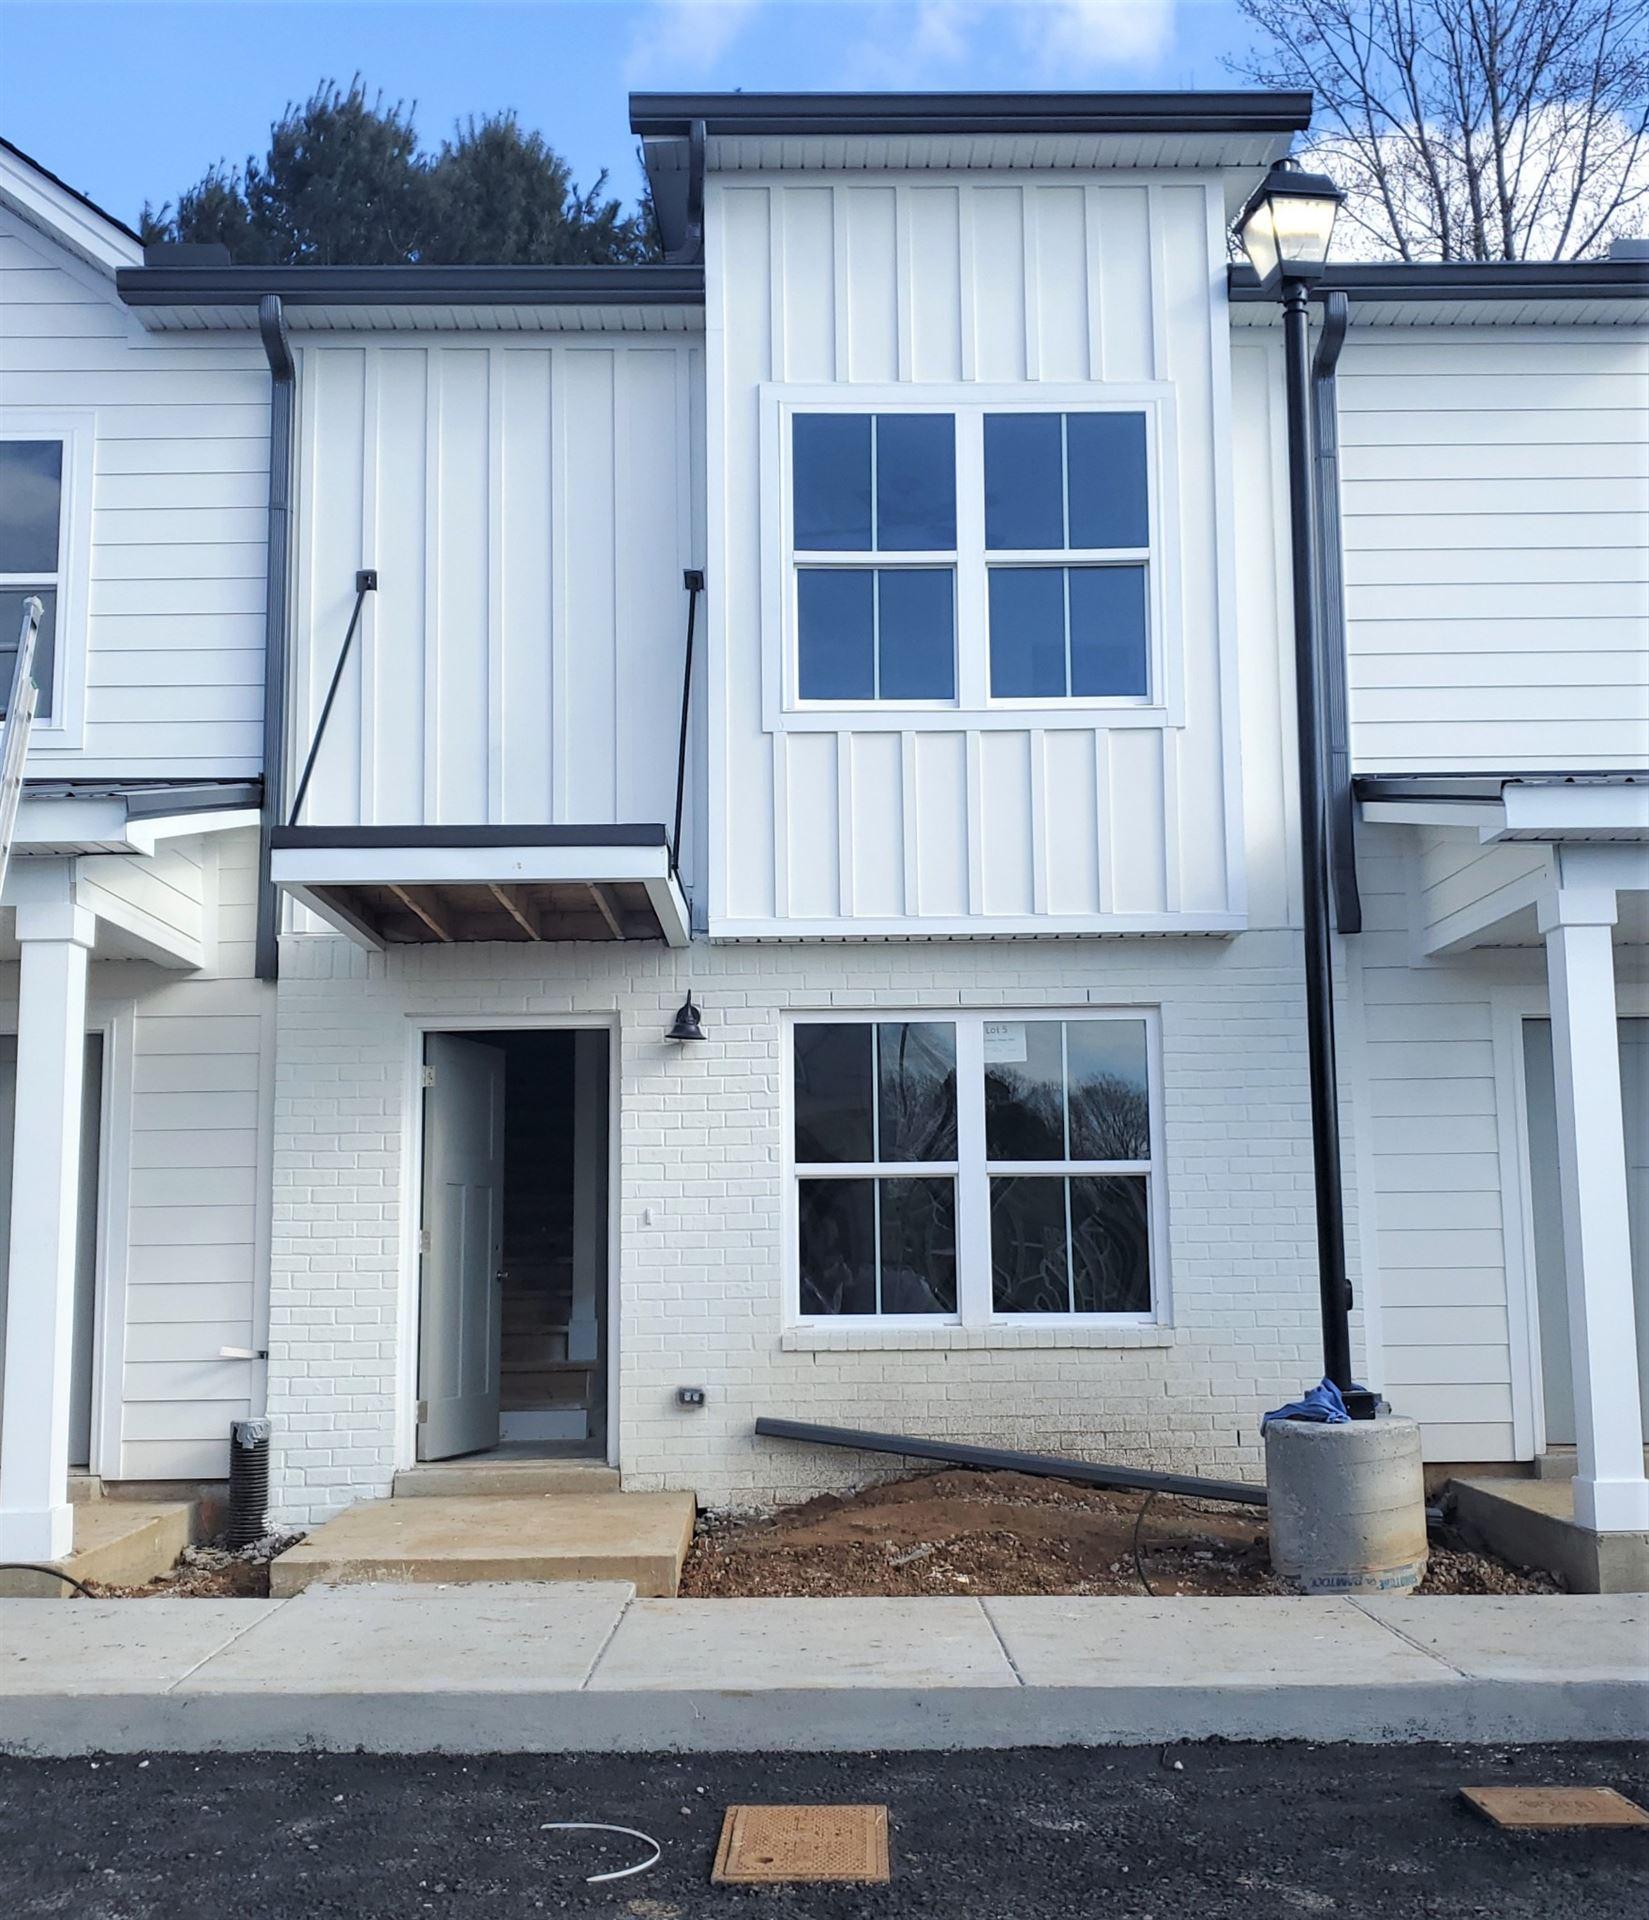 608 Hadley Village Blvd #608, Old Hickory, TN 37138 - MLS#: 2222147